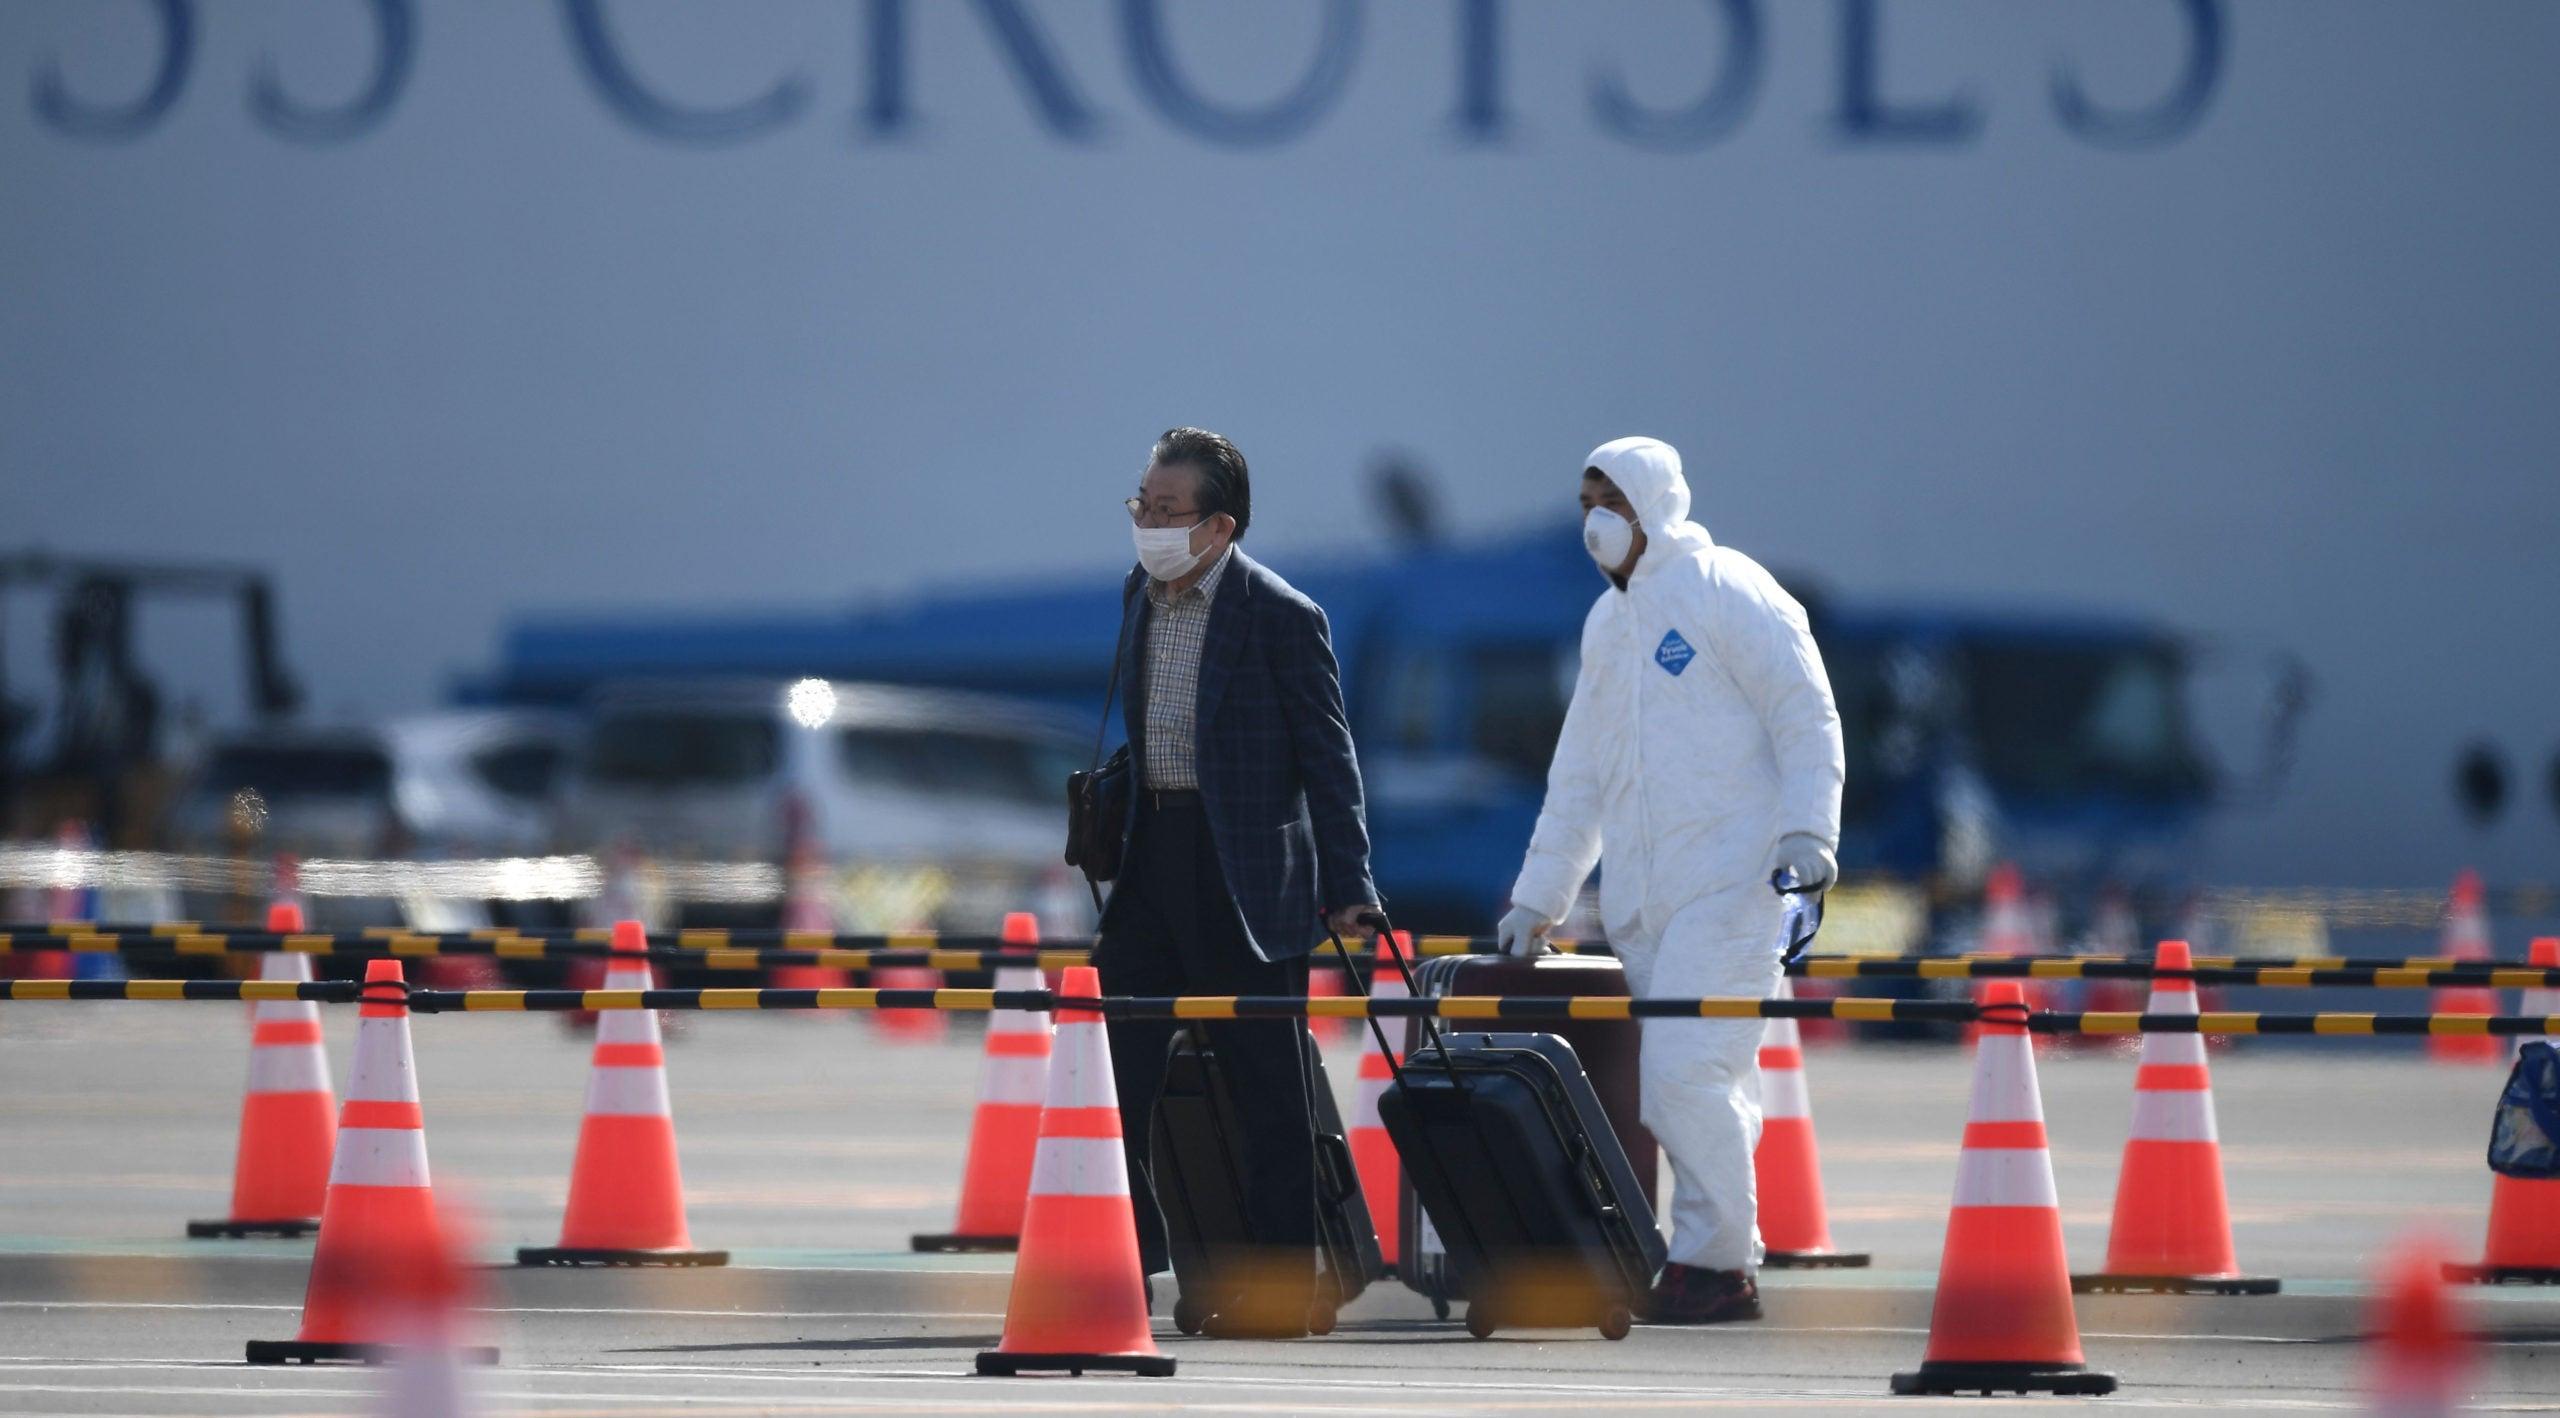 Diamond Princess cruise passengers disembark after 14-day quarantine ends in Japan-н зурган илэрц